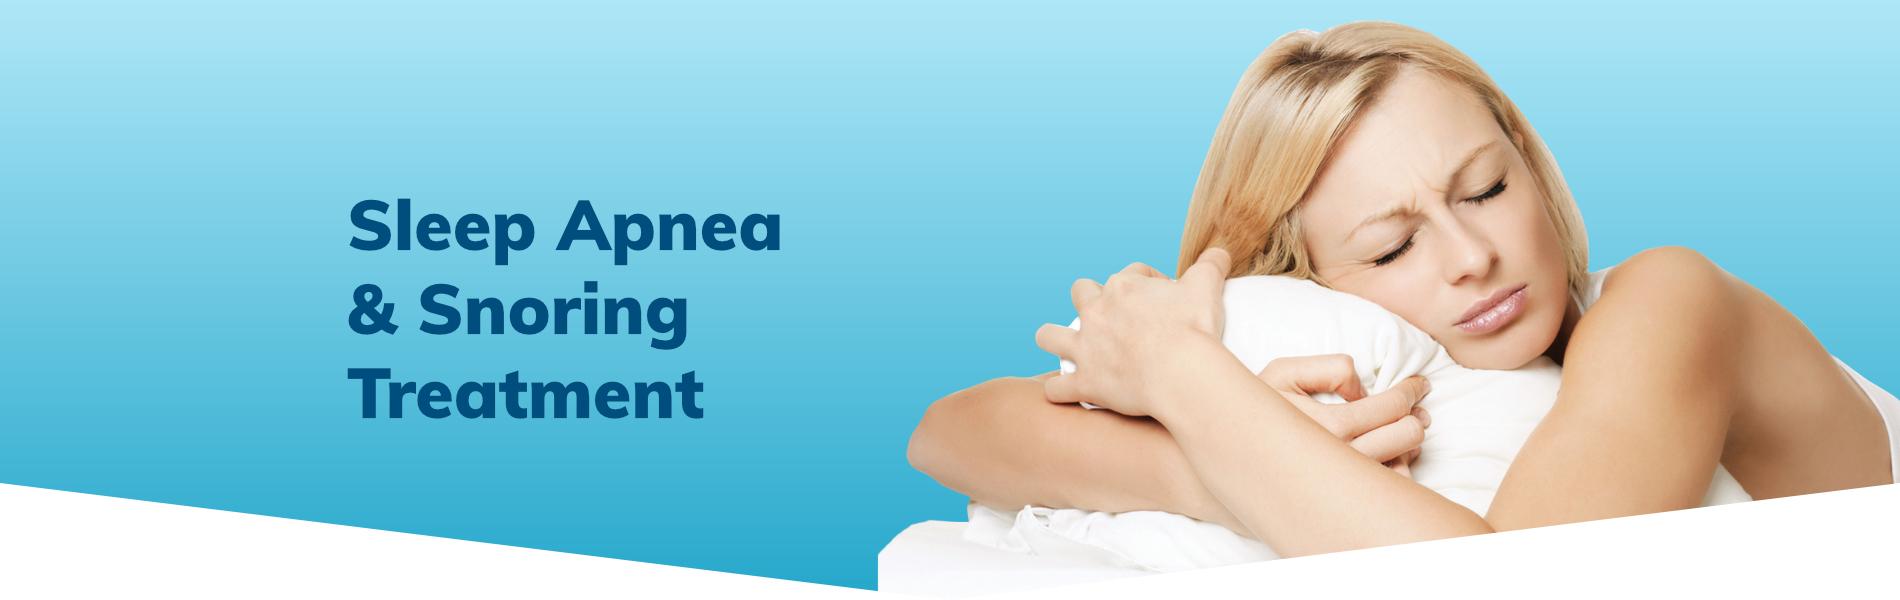 apnea-snoring-banner